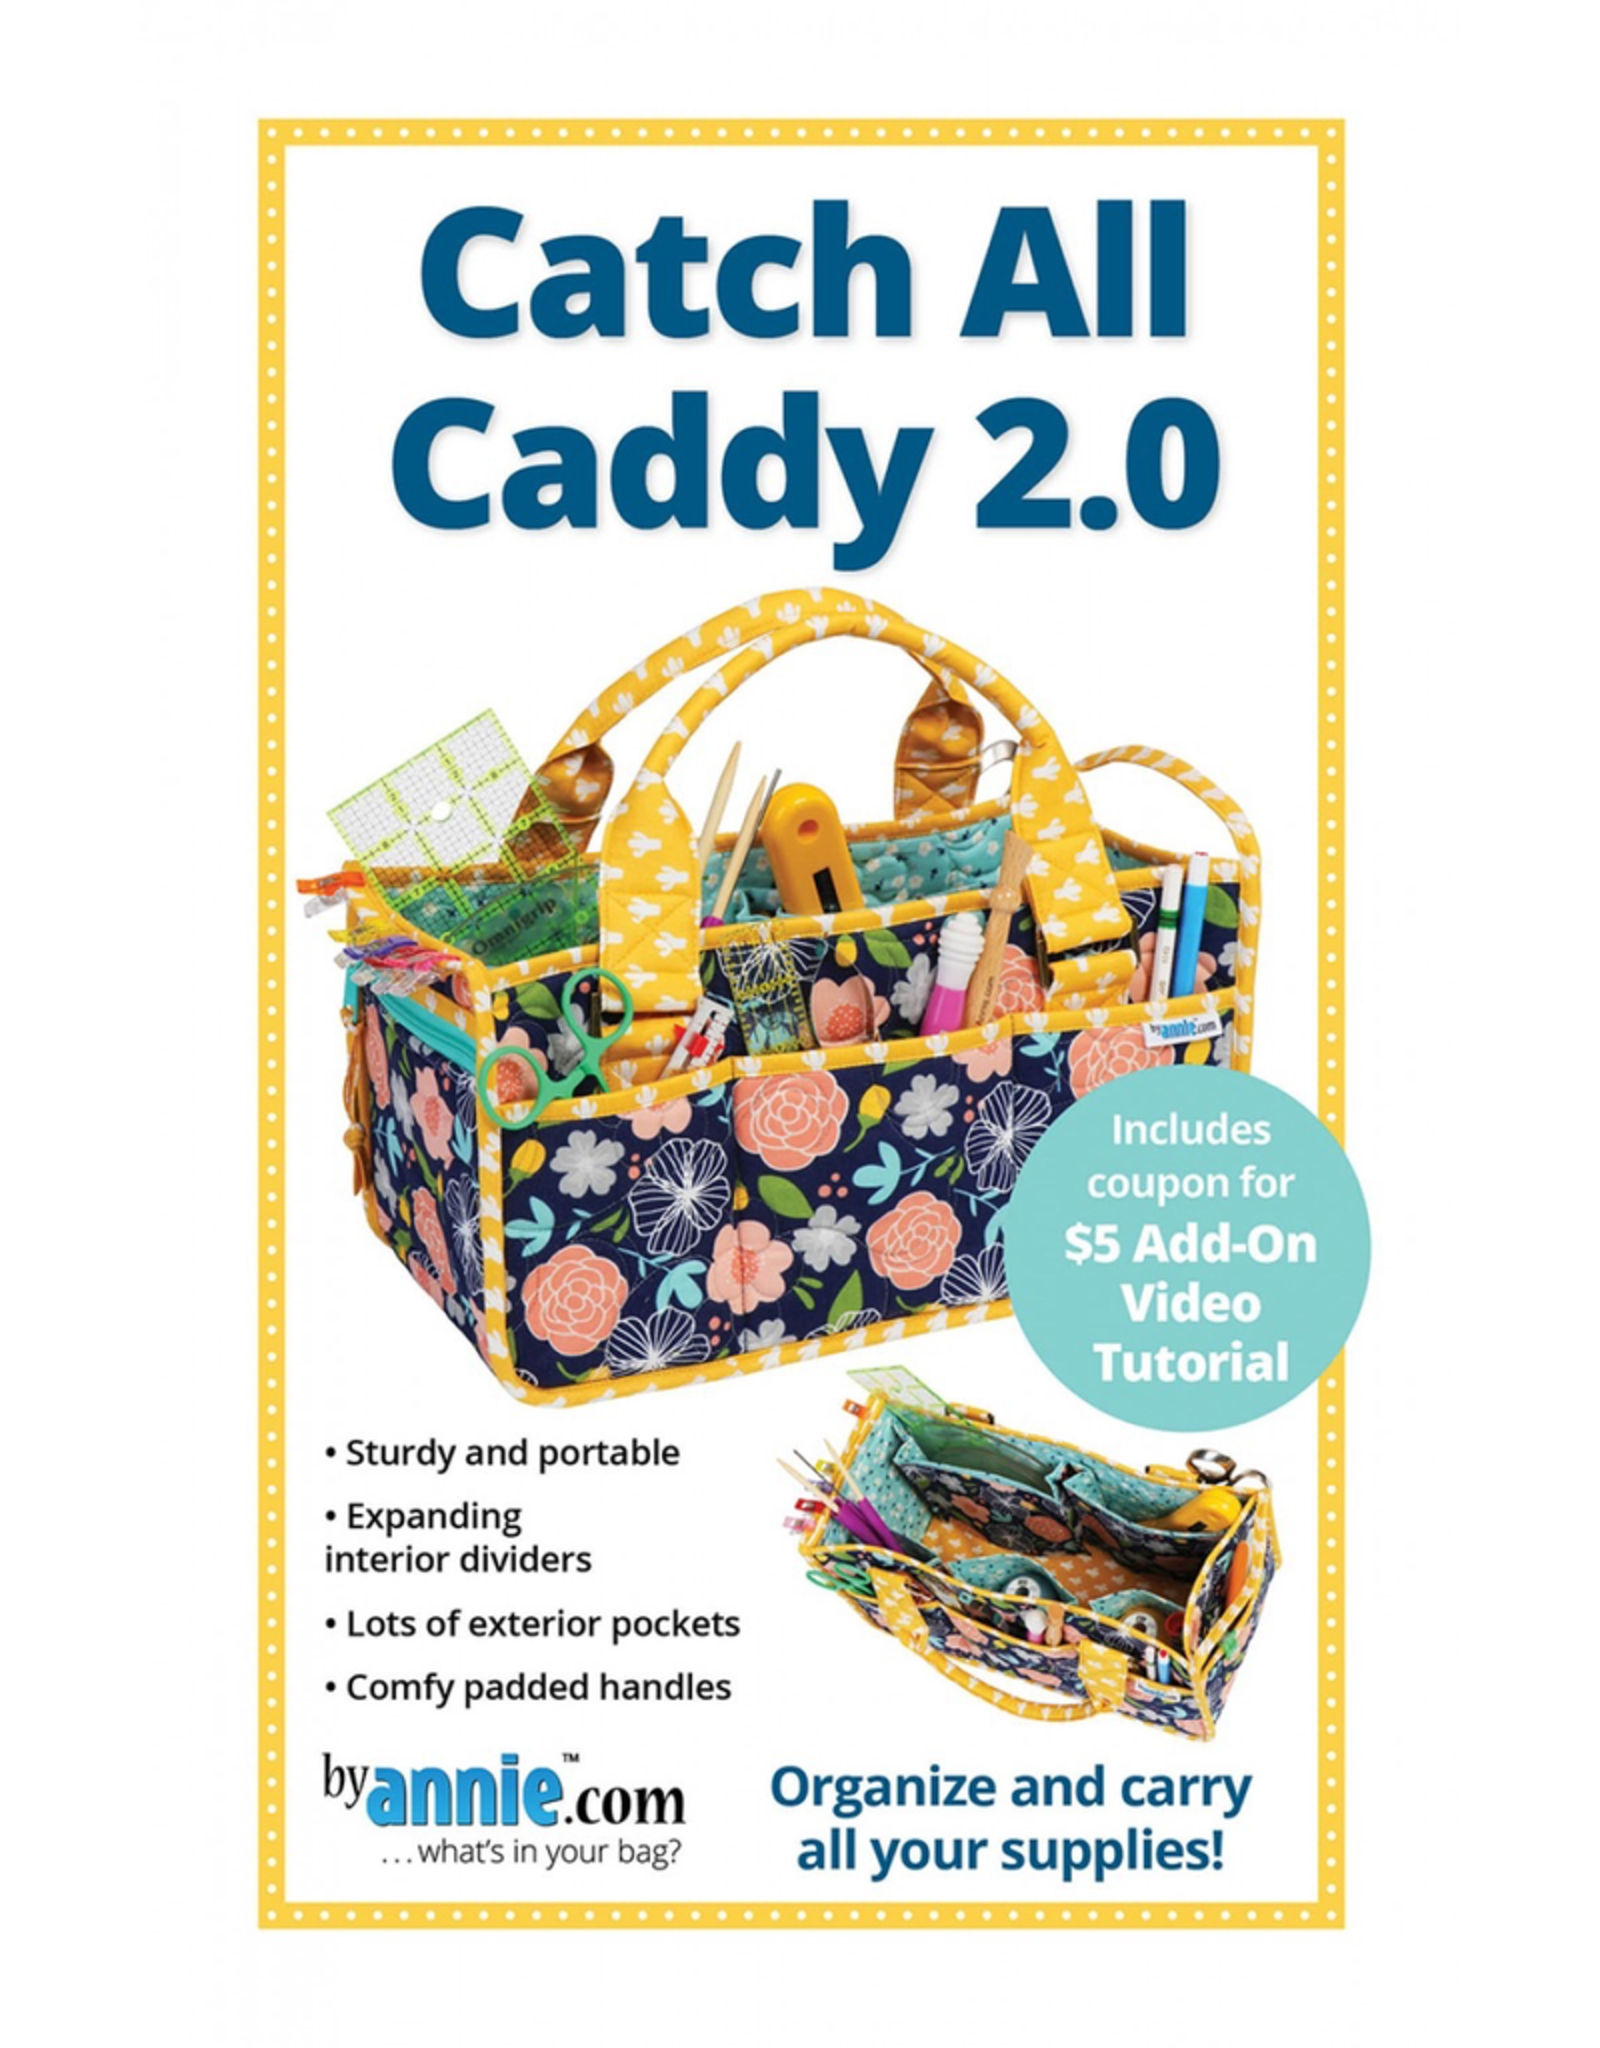 By Annie Catch All Caddy 2.0 Pattern